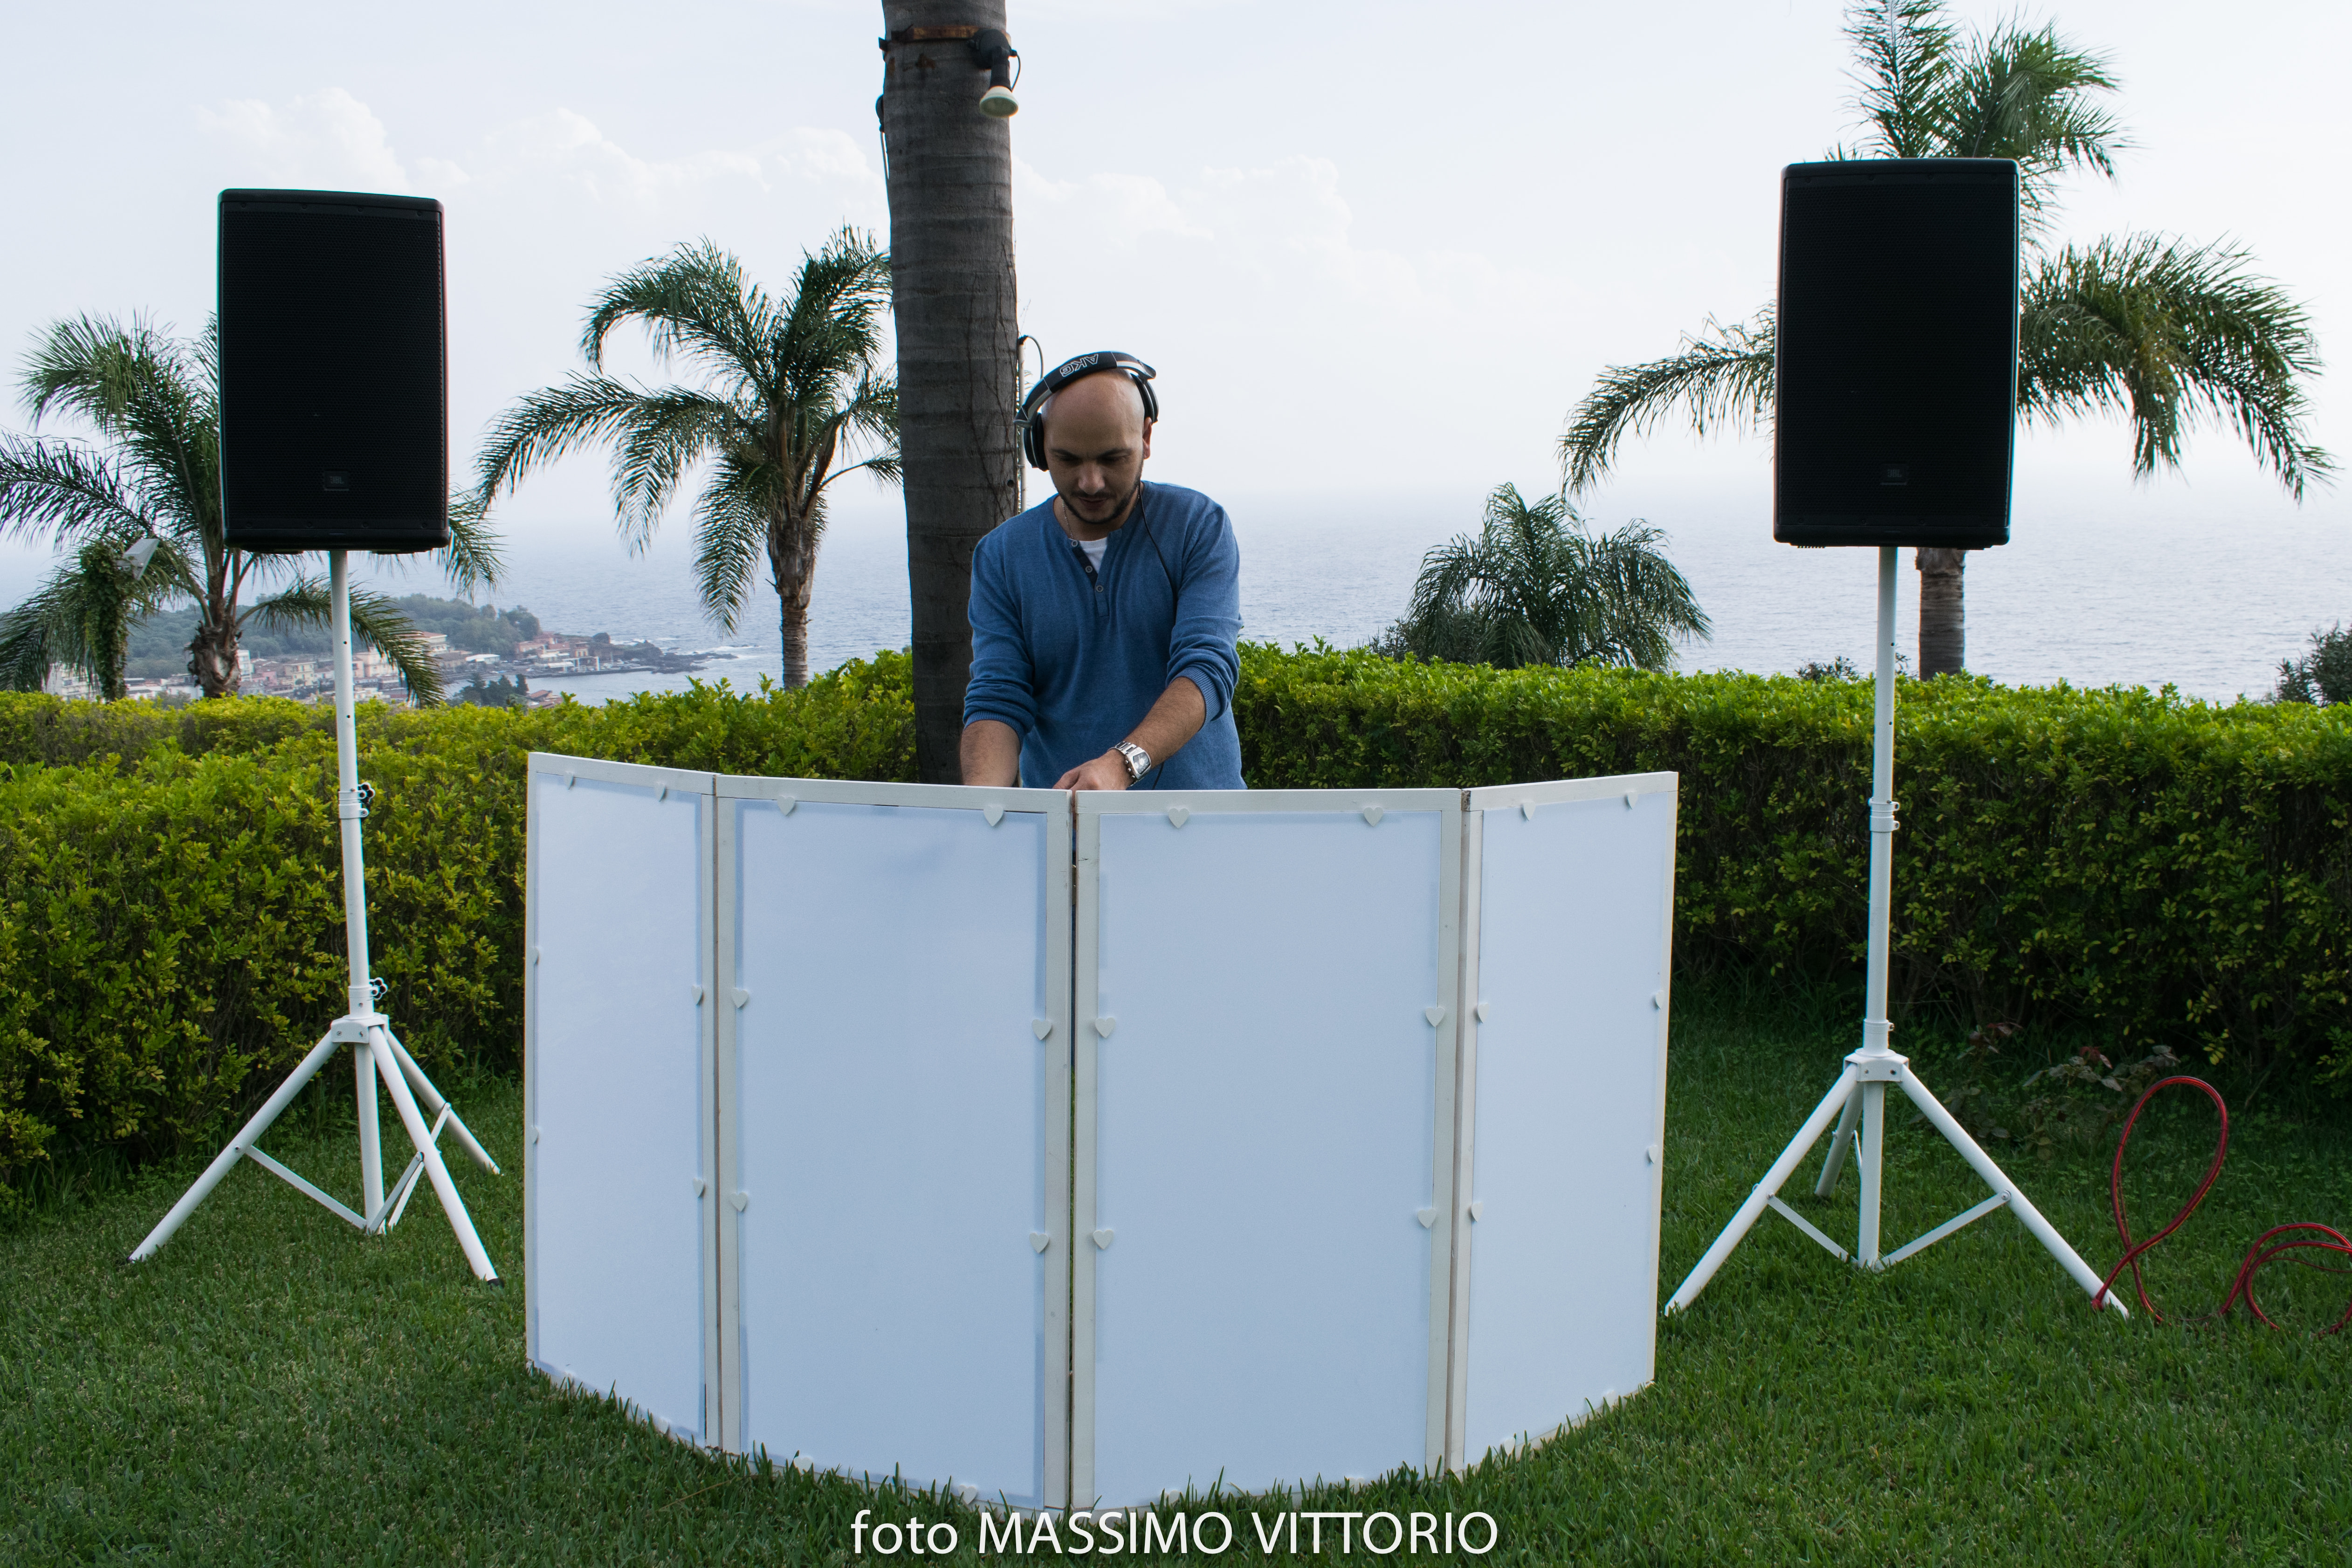 White-Setup-DMI-Golden-Events-Animazione-dj-dariob-dj elegante-dj prato-allestimento dj bianco-